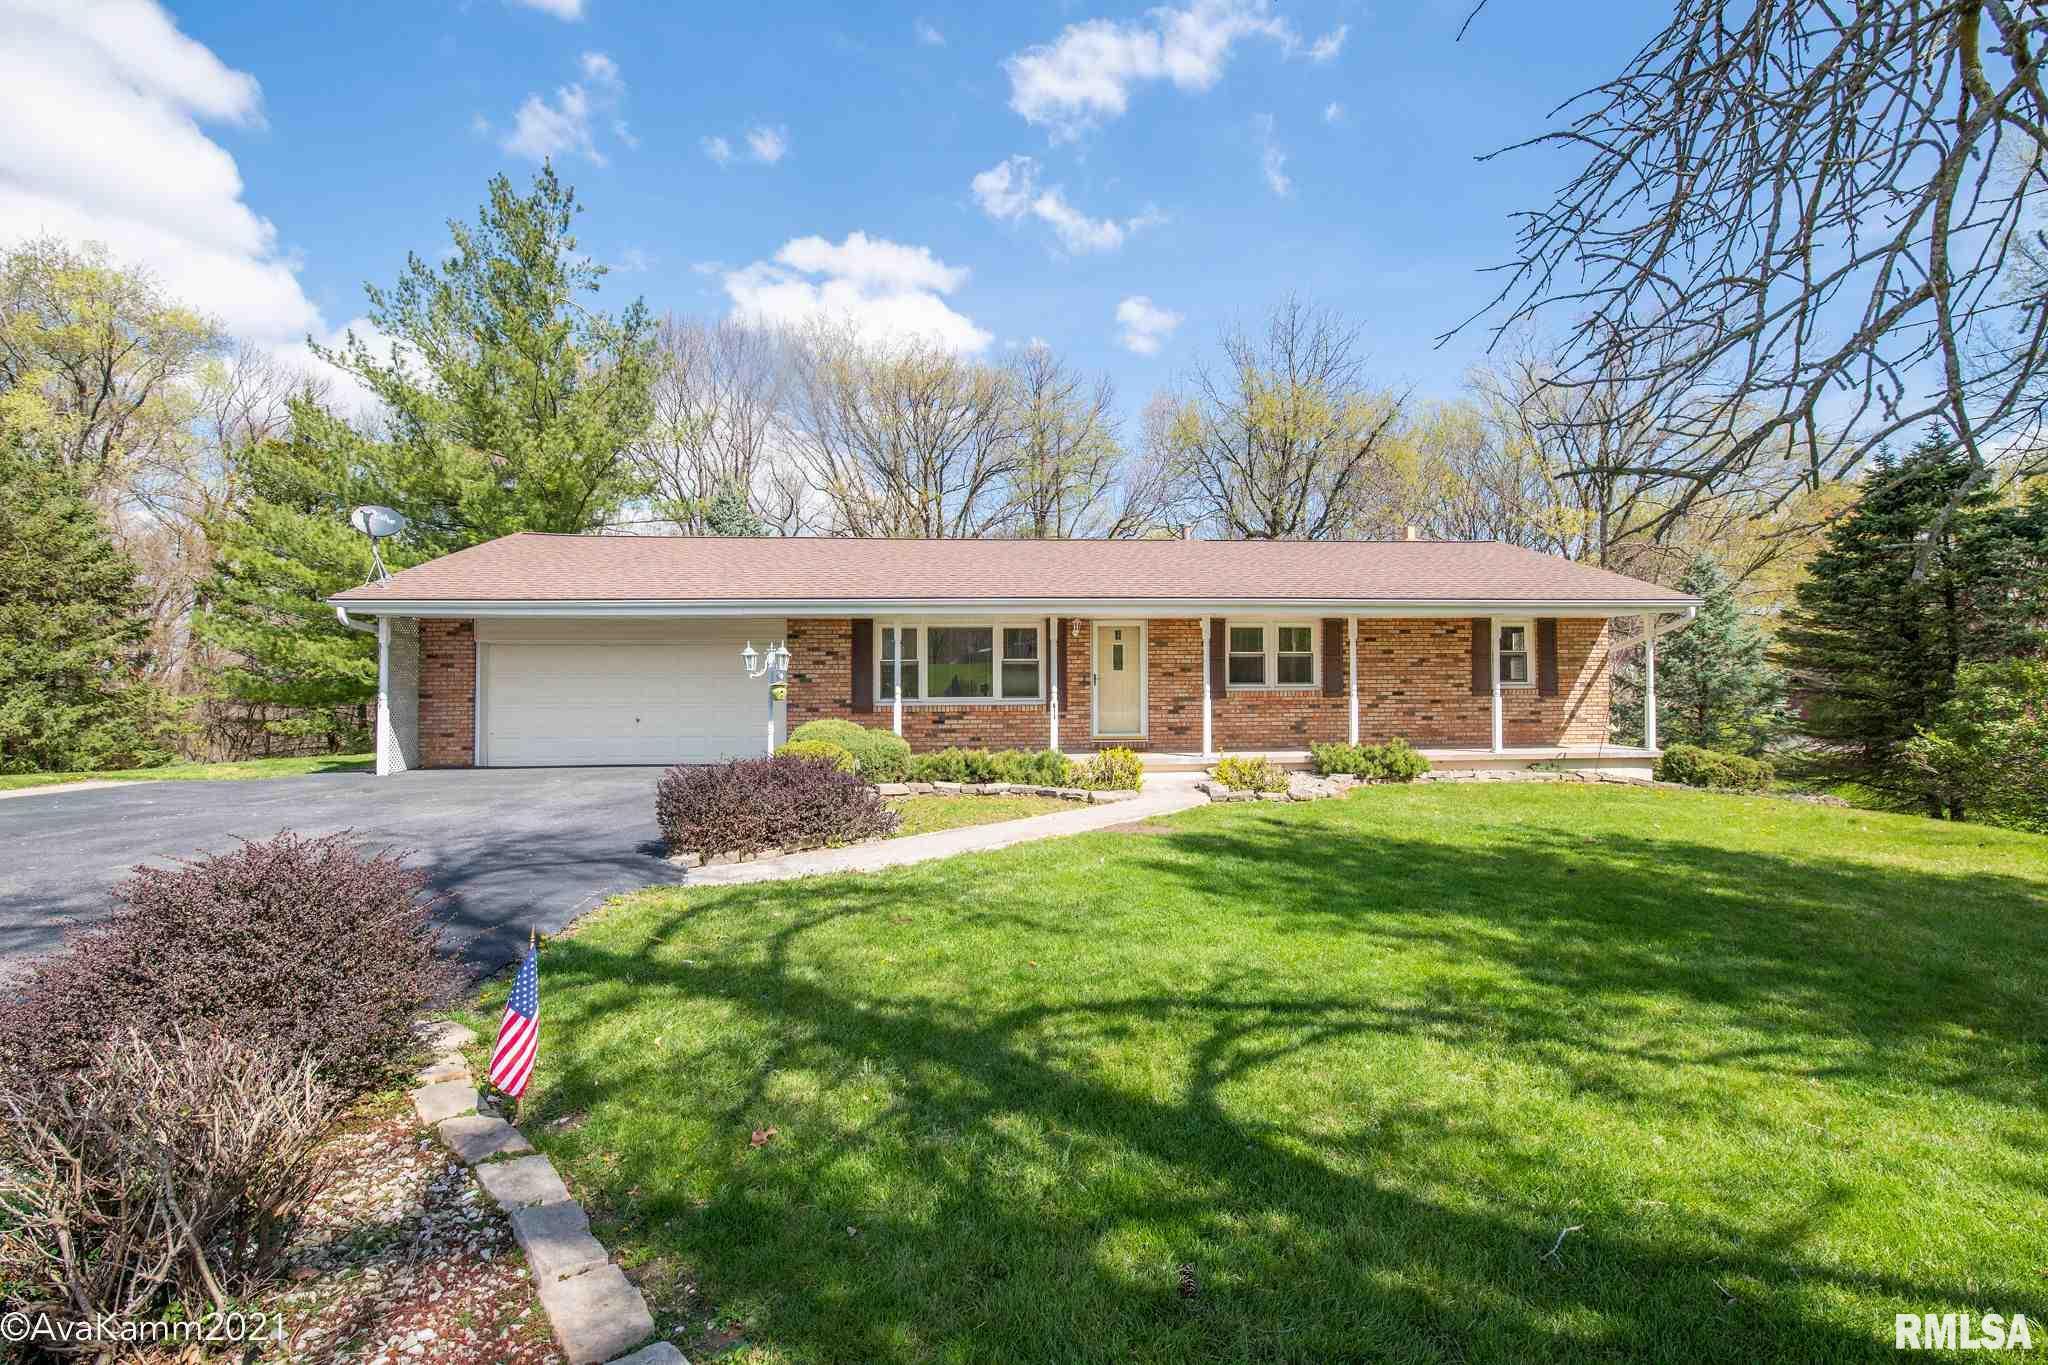 615 N STEWART Property Photo - Creve Coeur, IL real estate listing